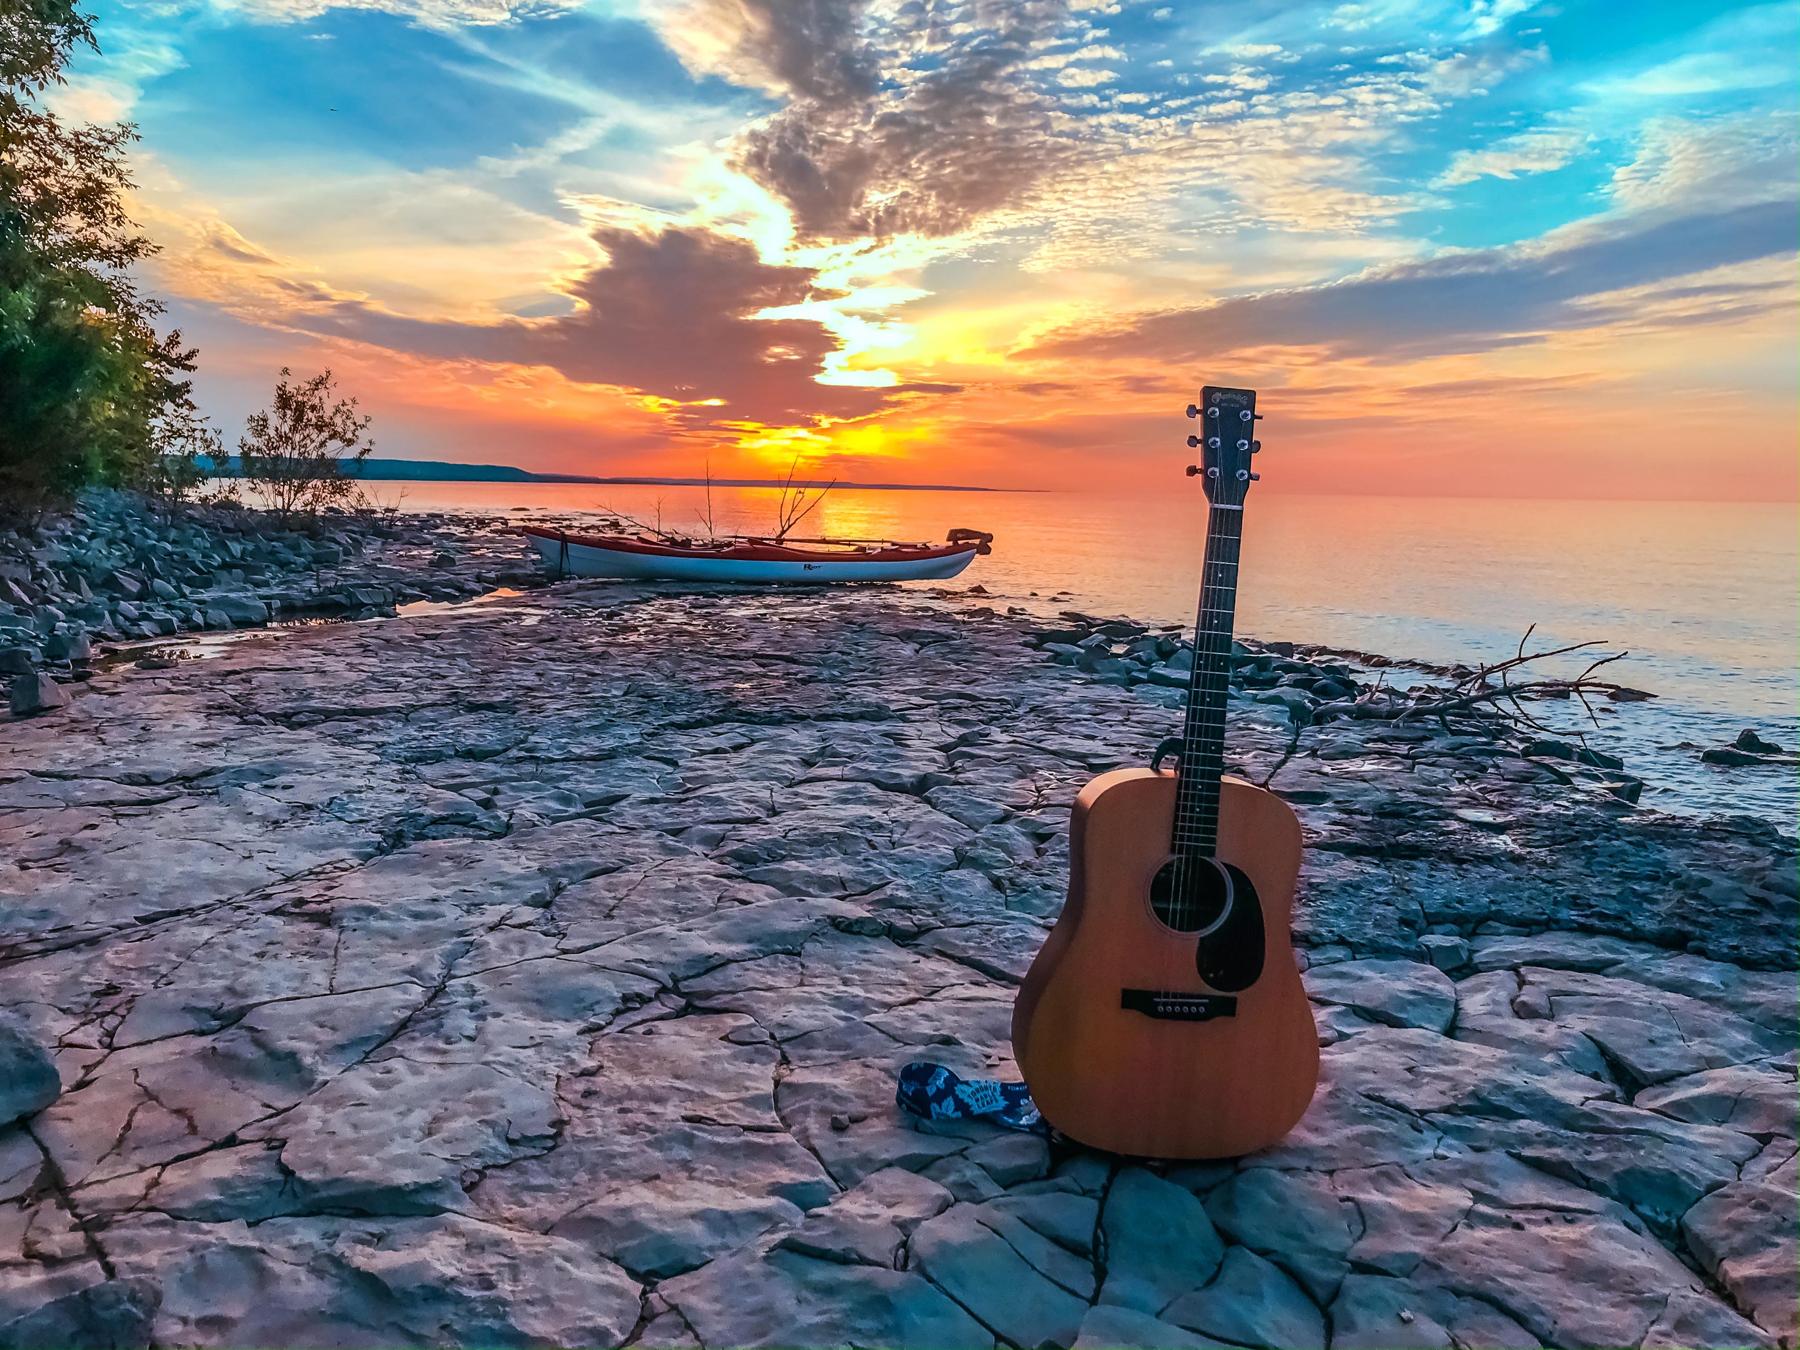 jake guitar for invite